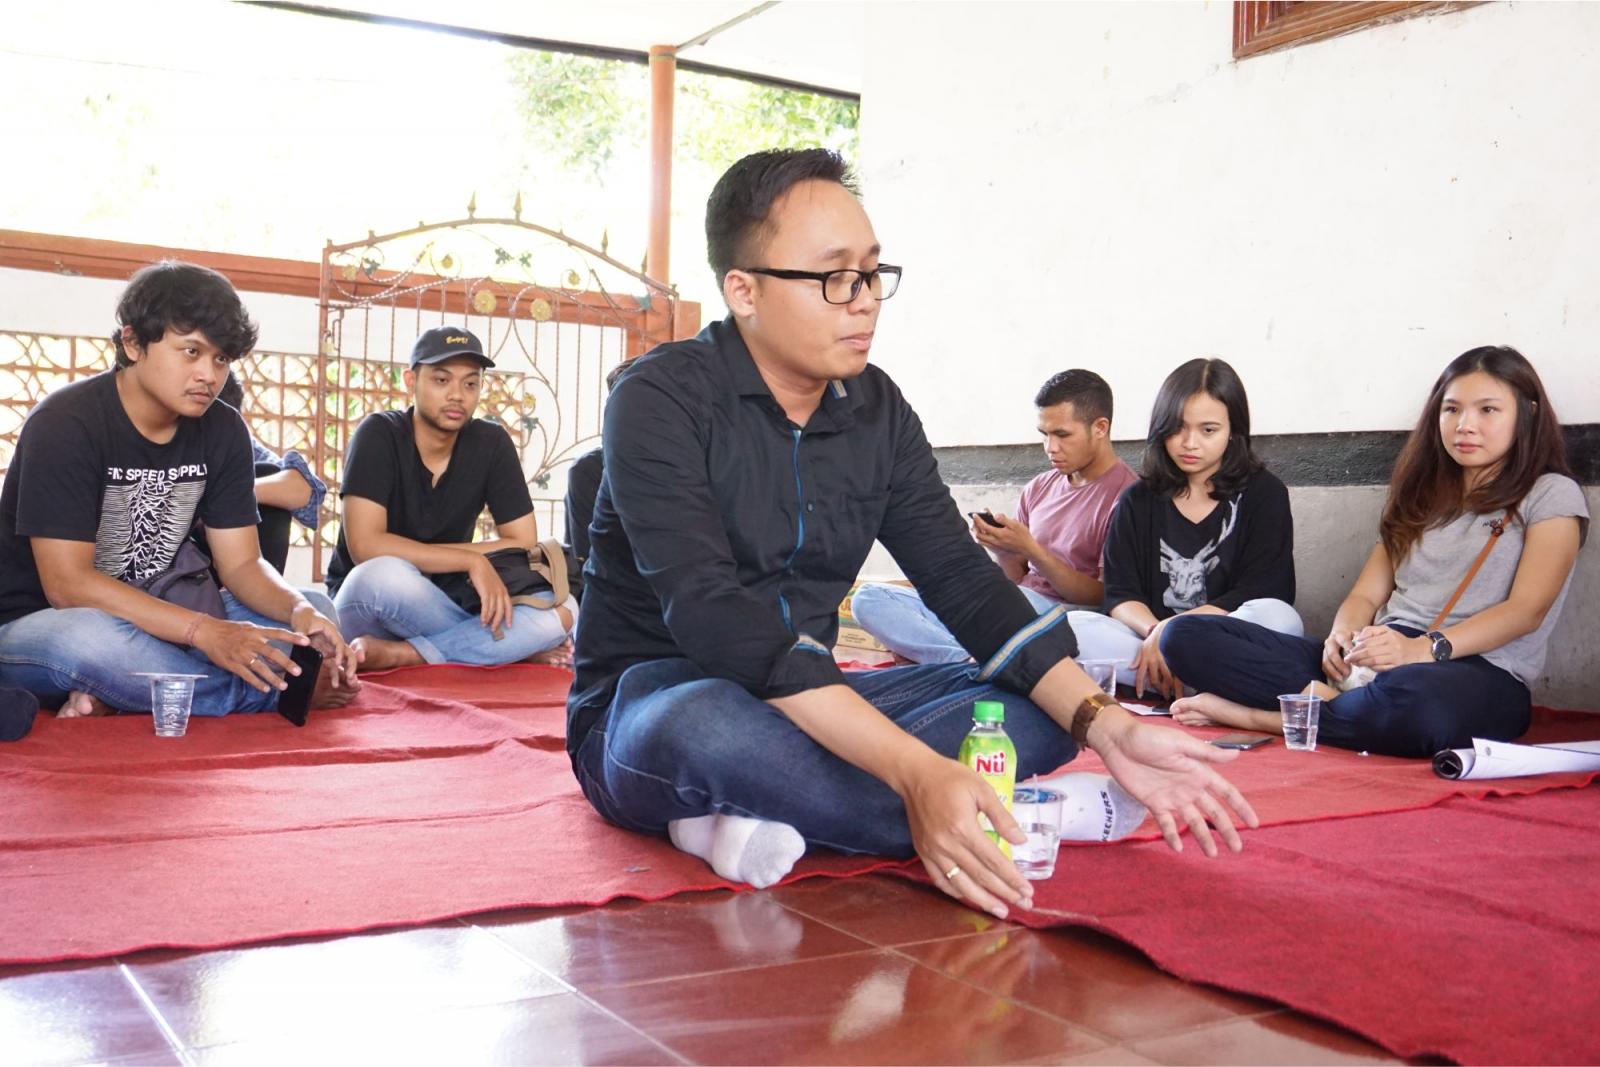 Bali Emporio Architect Team Conducts Charity Activities to Yasa Kerti Karangasem Orphanage Foundatio 7